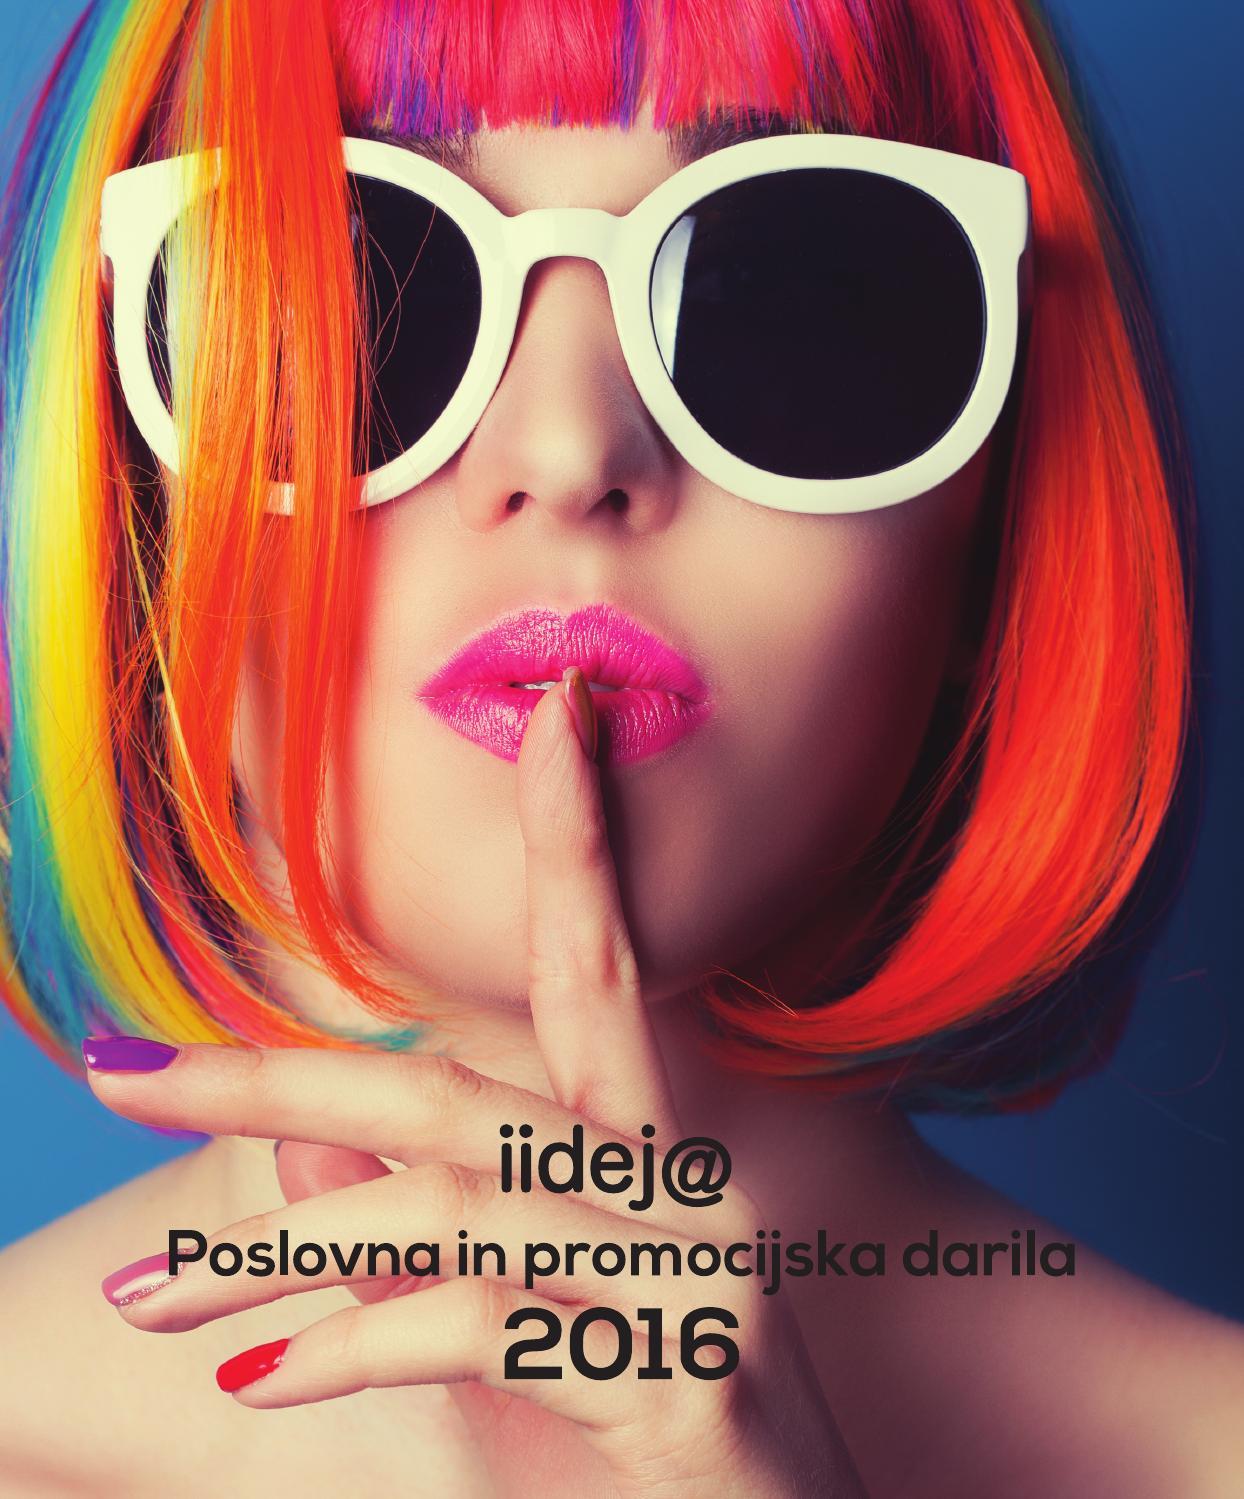 Poslovna darila iidej@ 2016 by Magma poslovna darila, d.o.o. - issuu